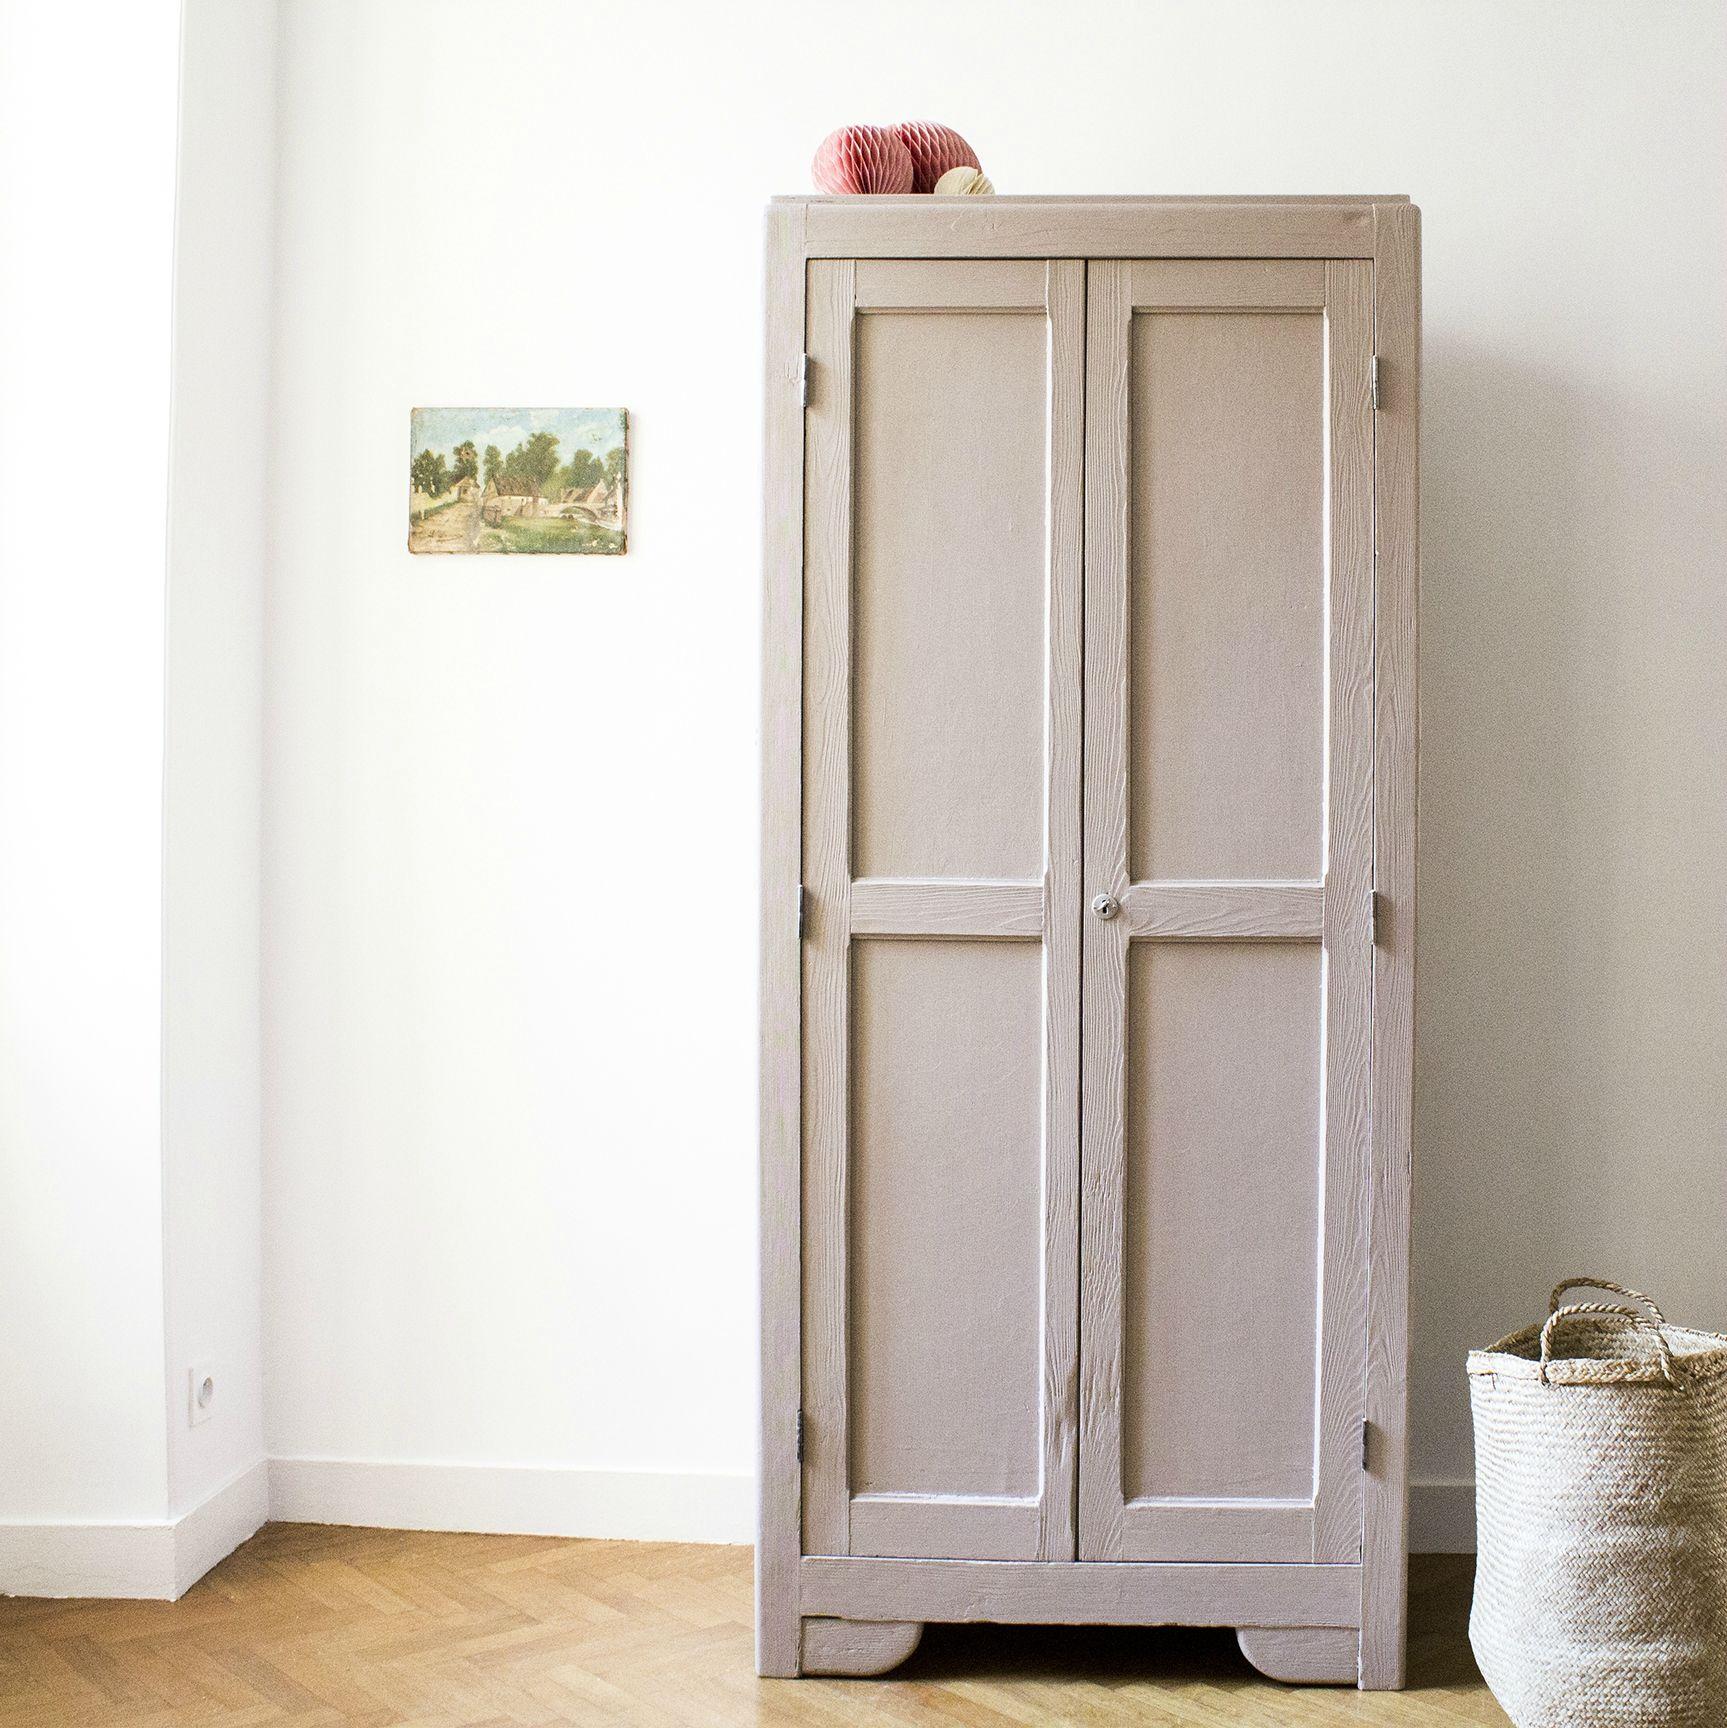 Farrow And Ball Pale Blue Bedroom: Front Door - Dead Salmon Farrow & Ball